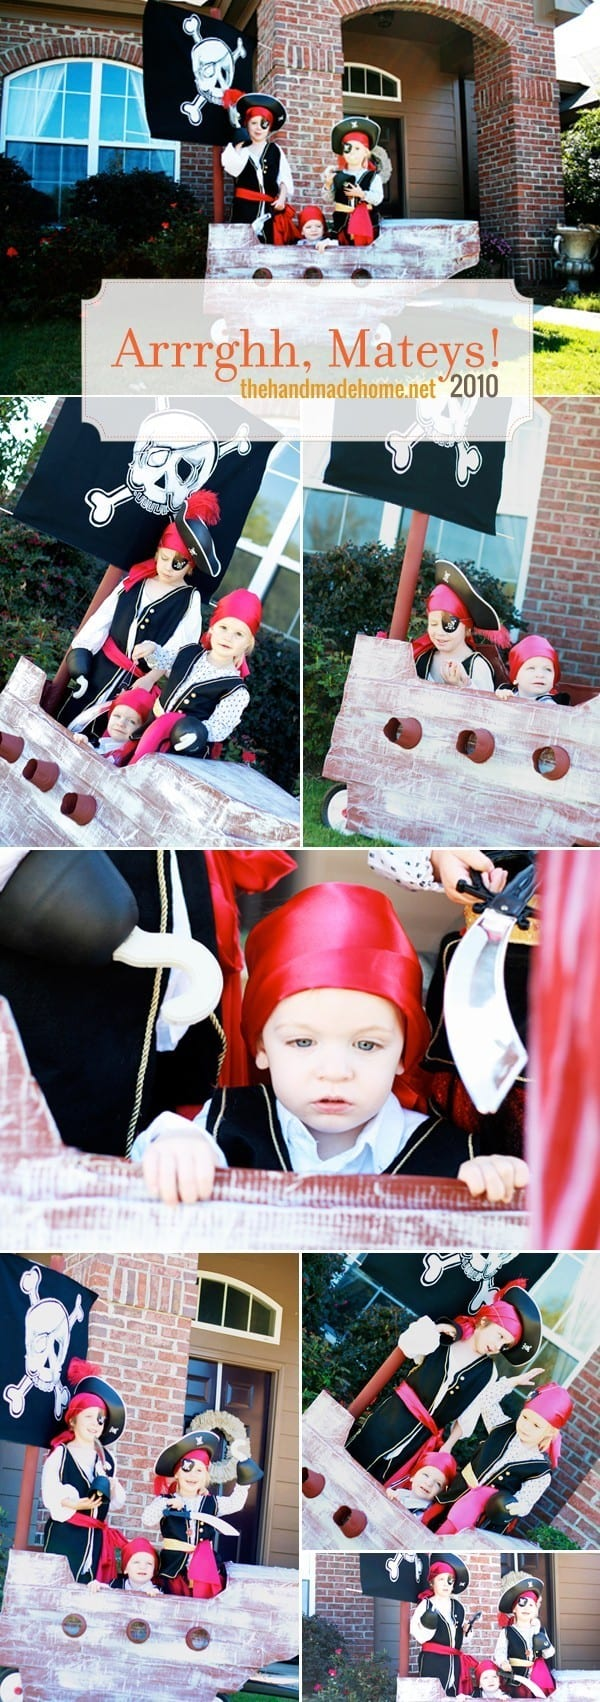 pirate_costumes